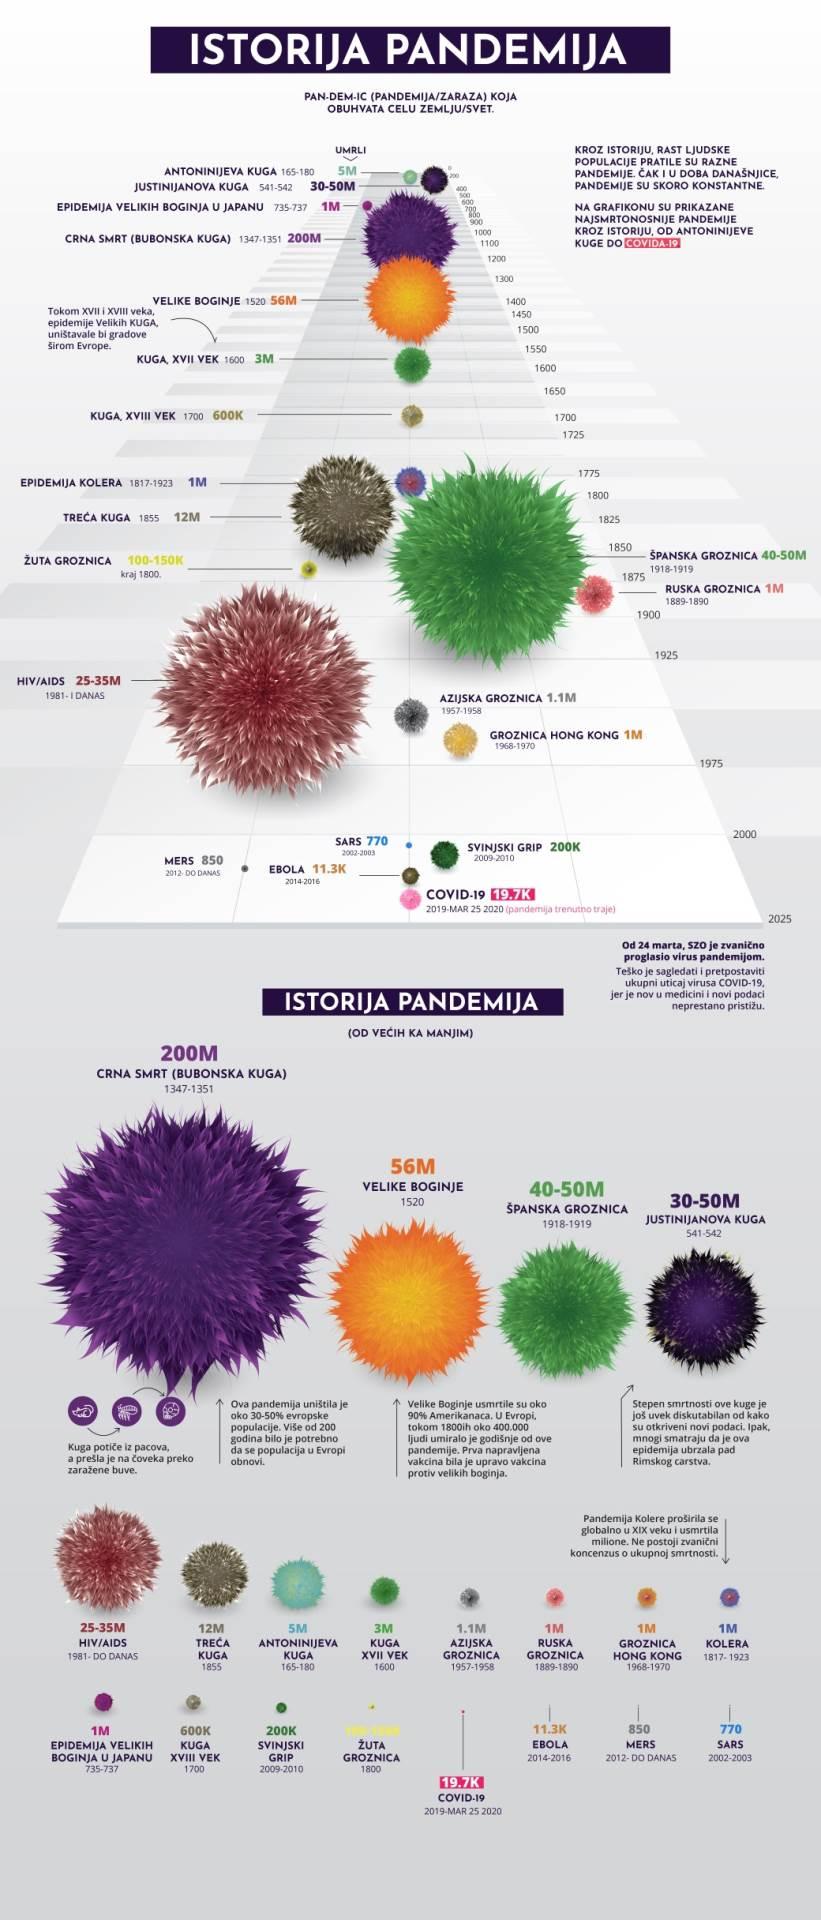 istorija pandemija, pandemija, epidemije, epidemija